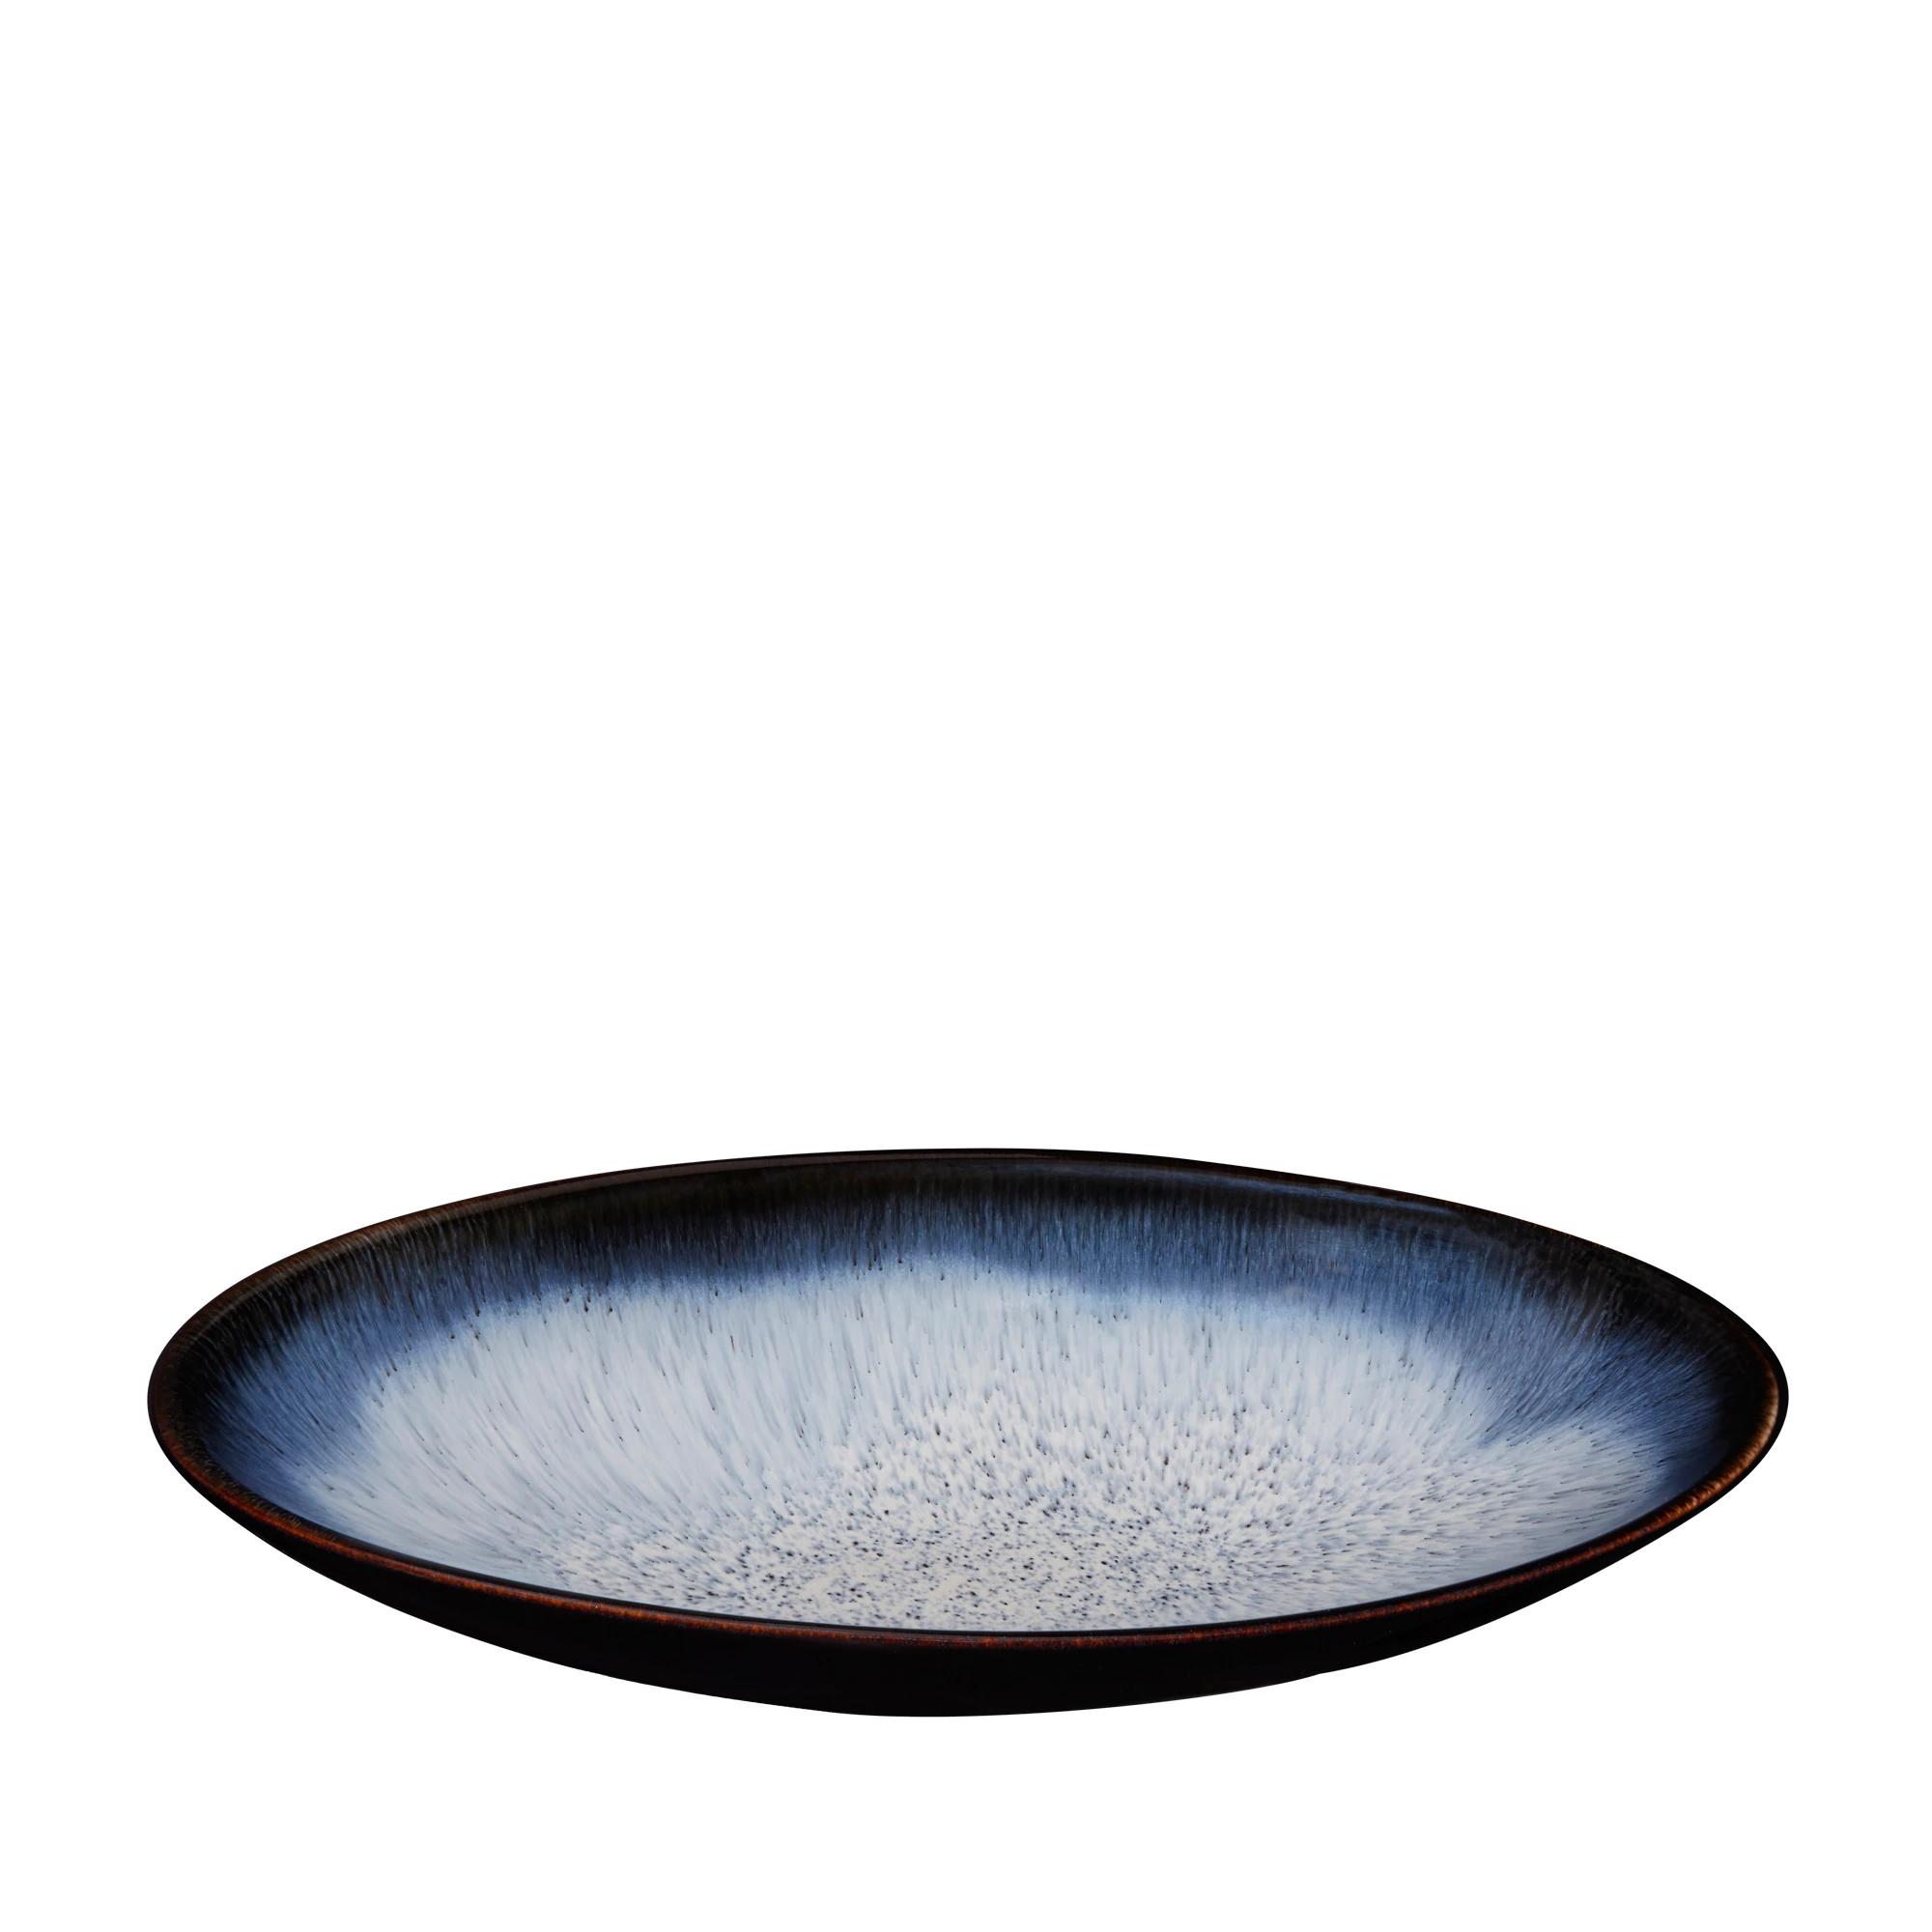 Denby Halo Large Oval Serving Dish